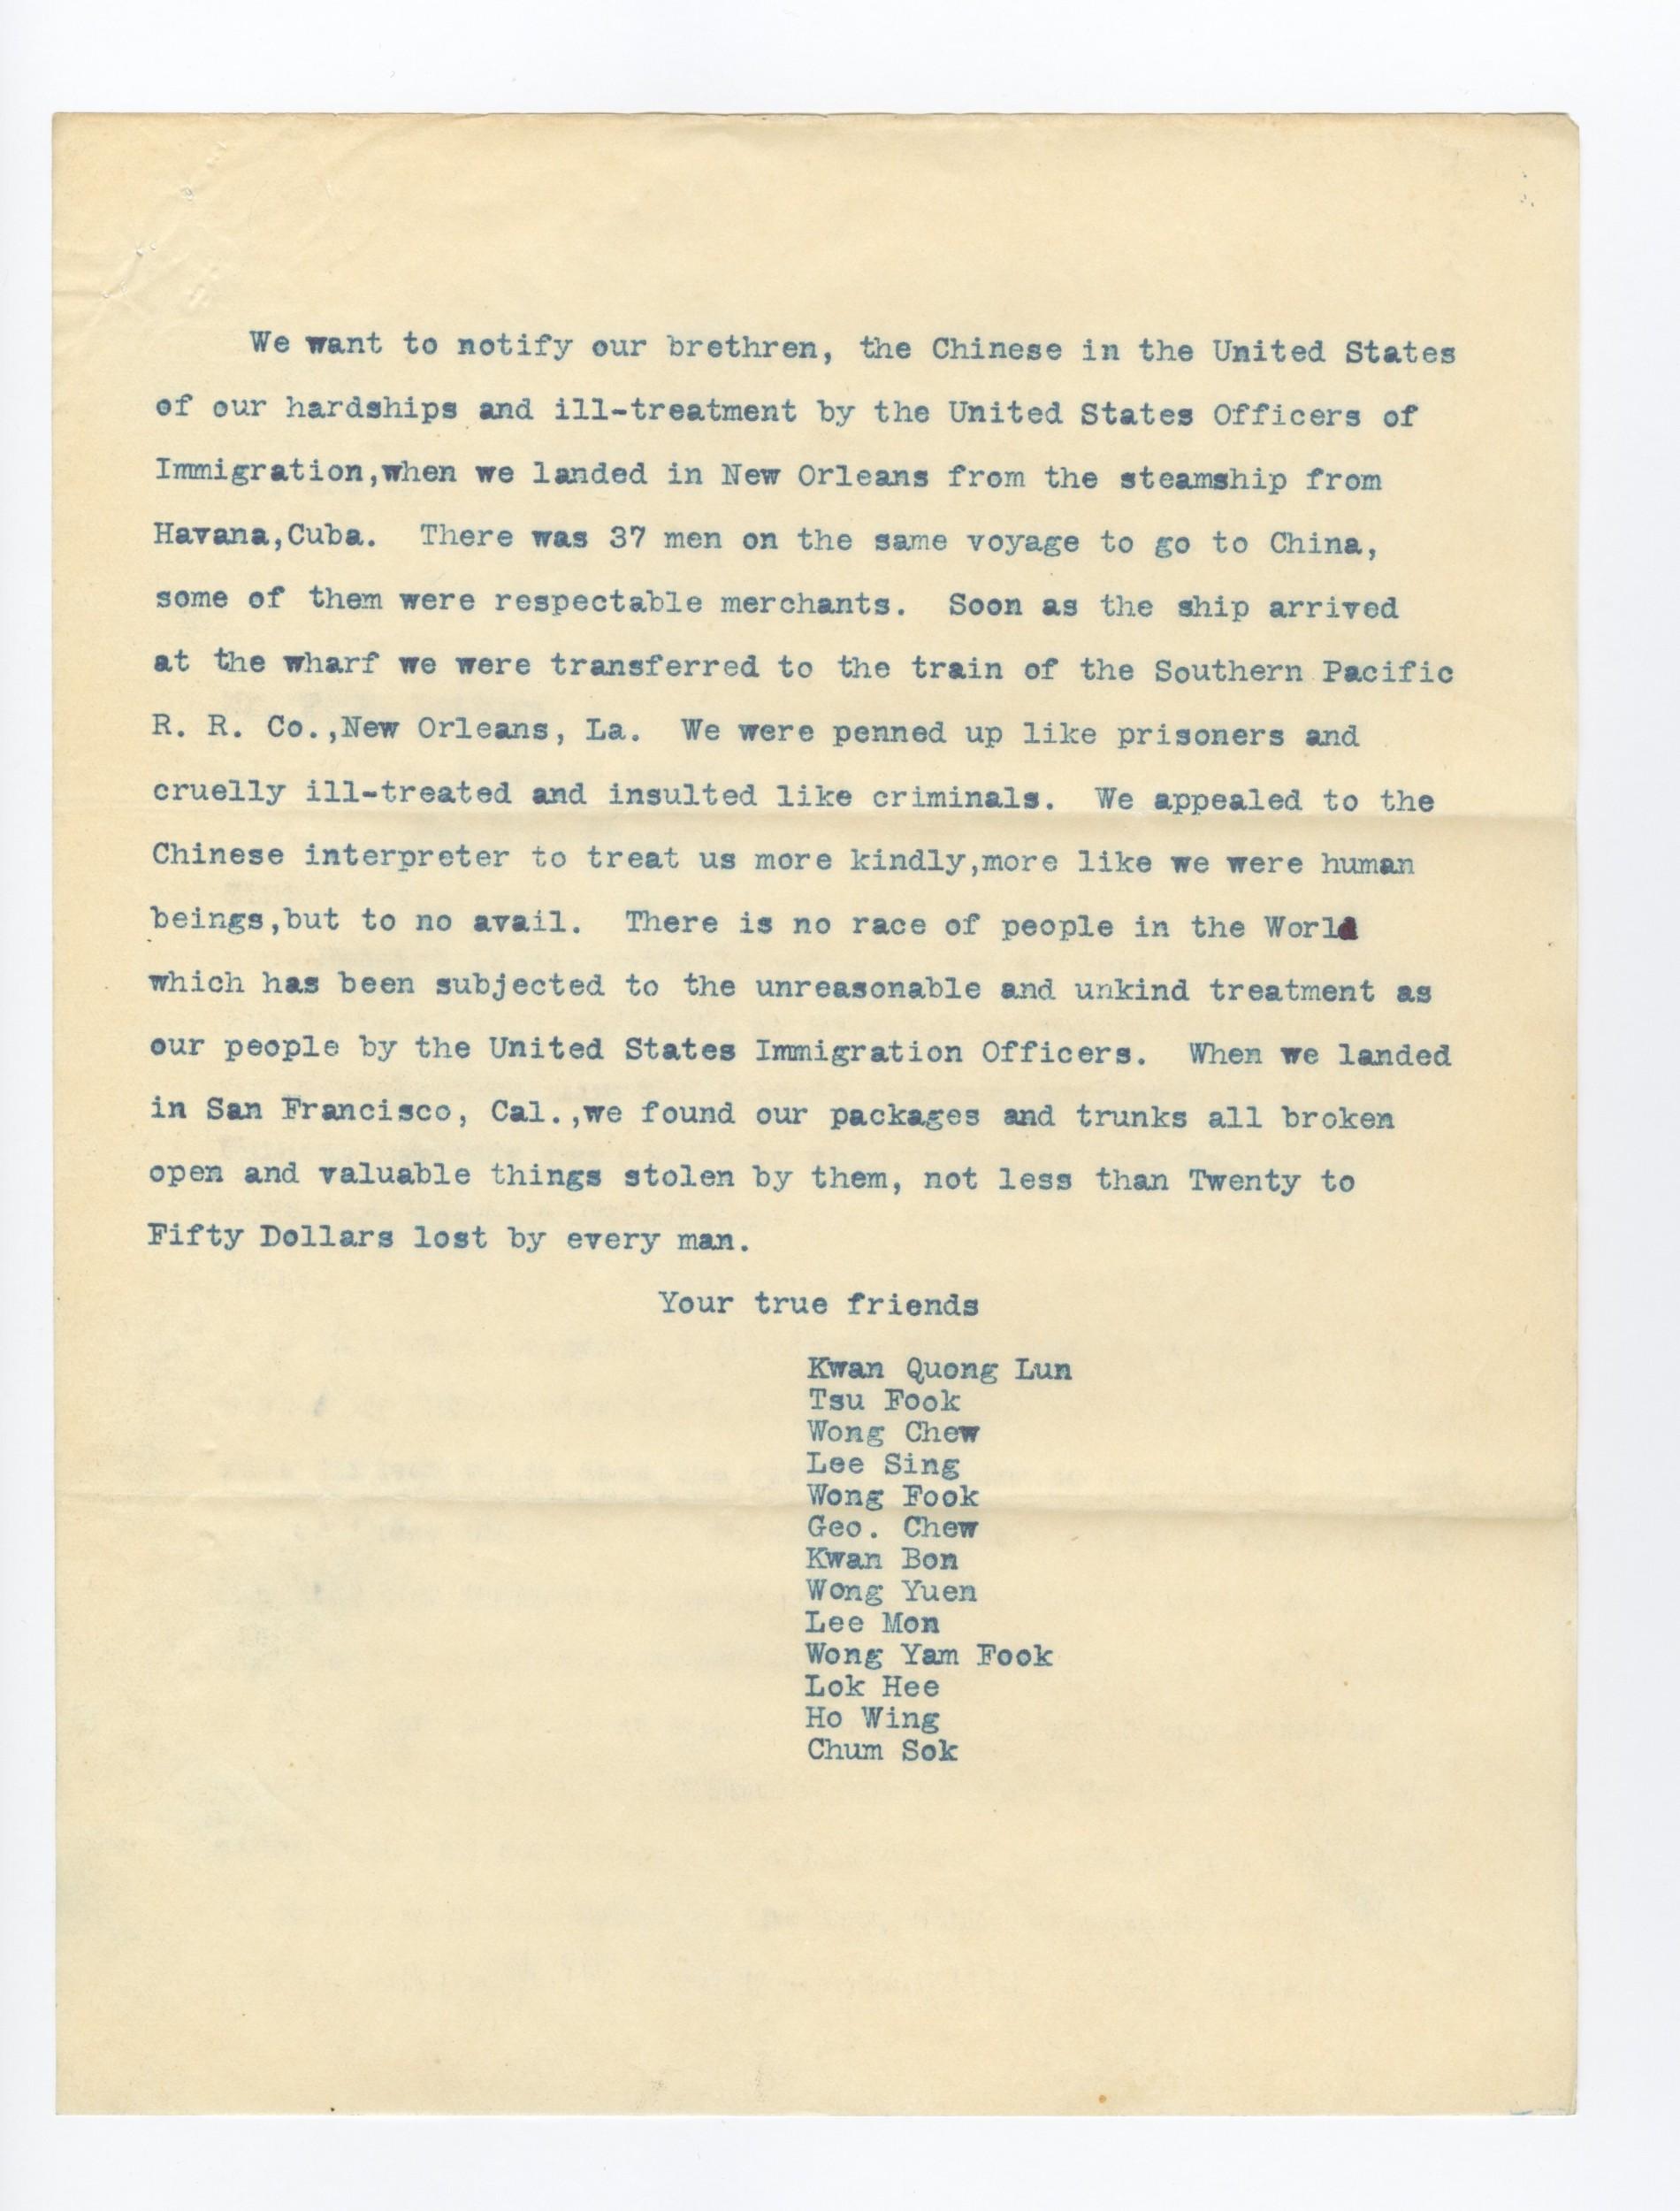 Immigration Records 1970s Translation